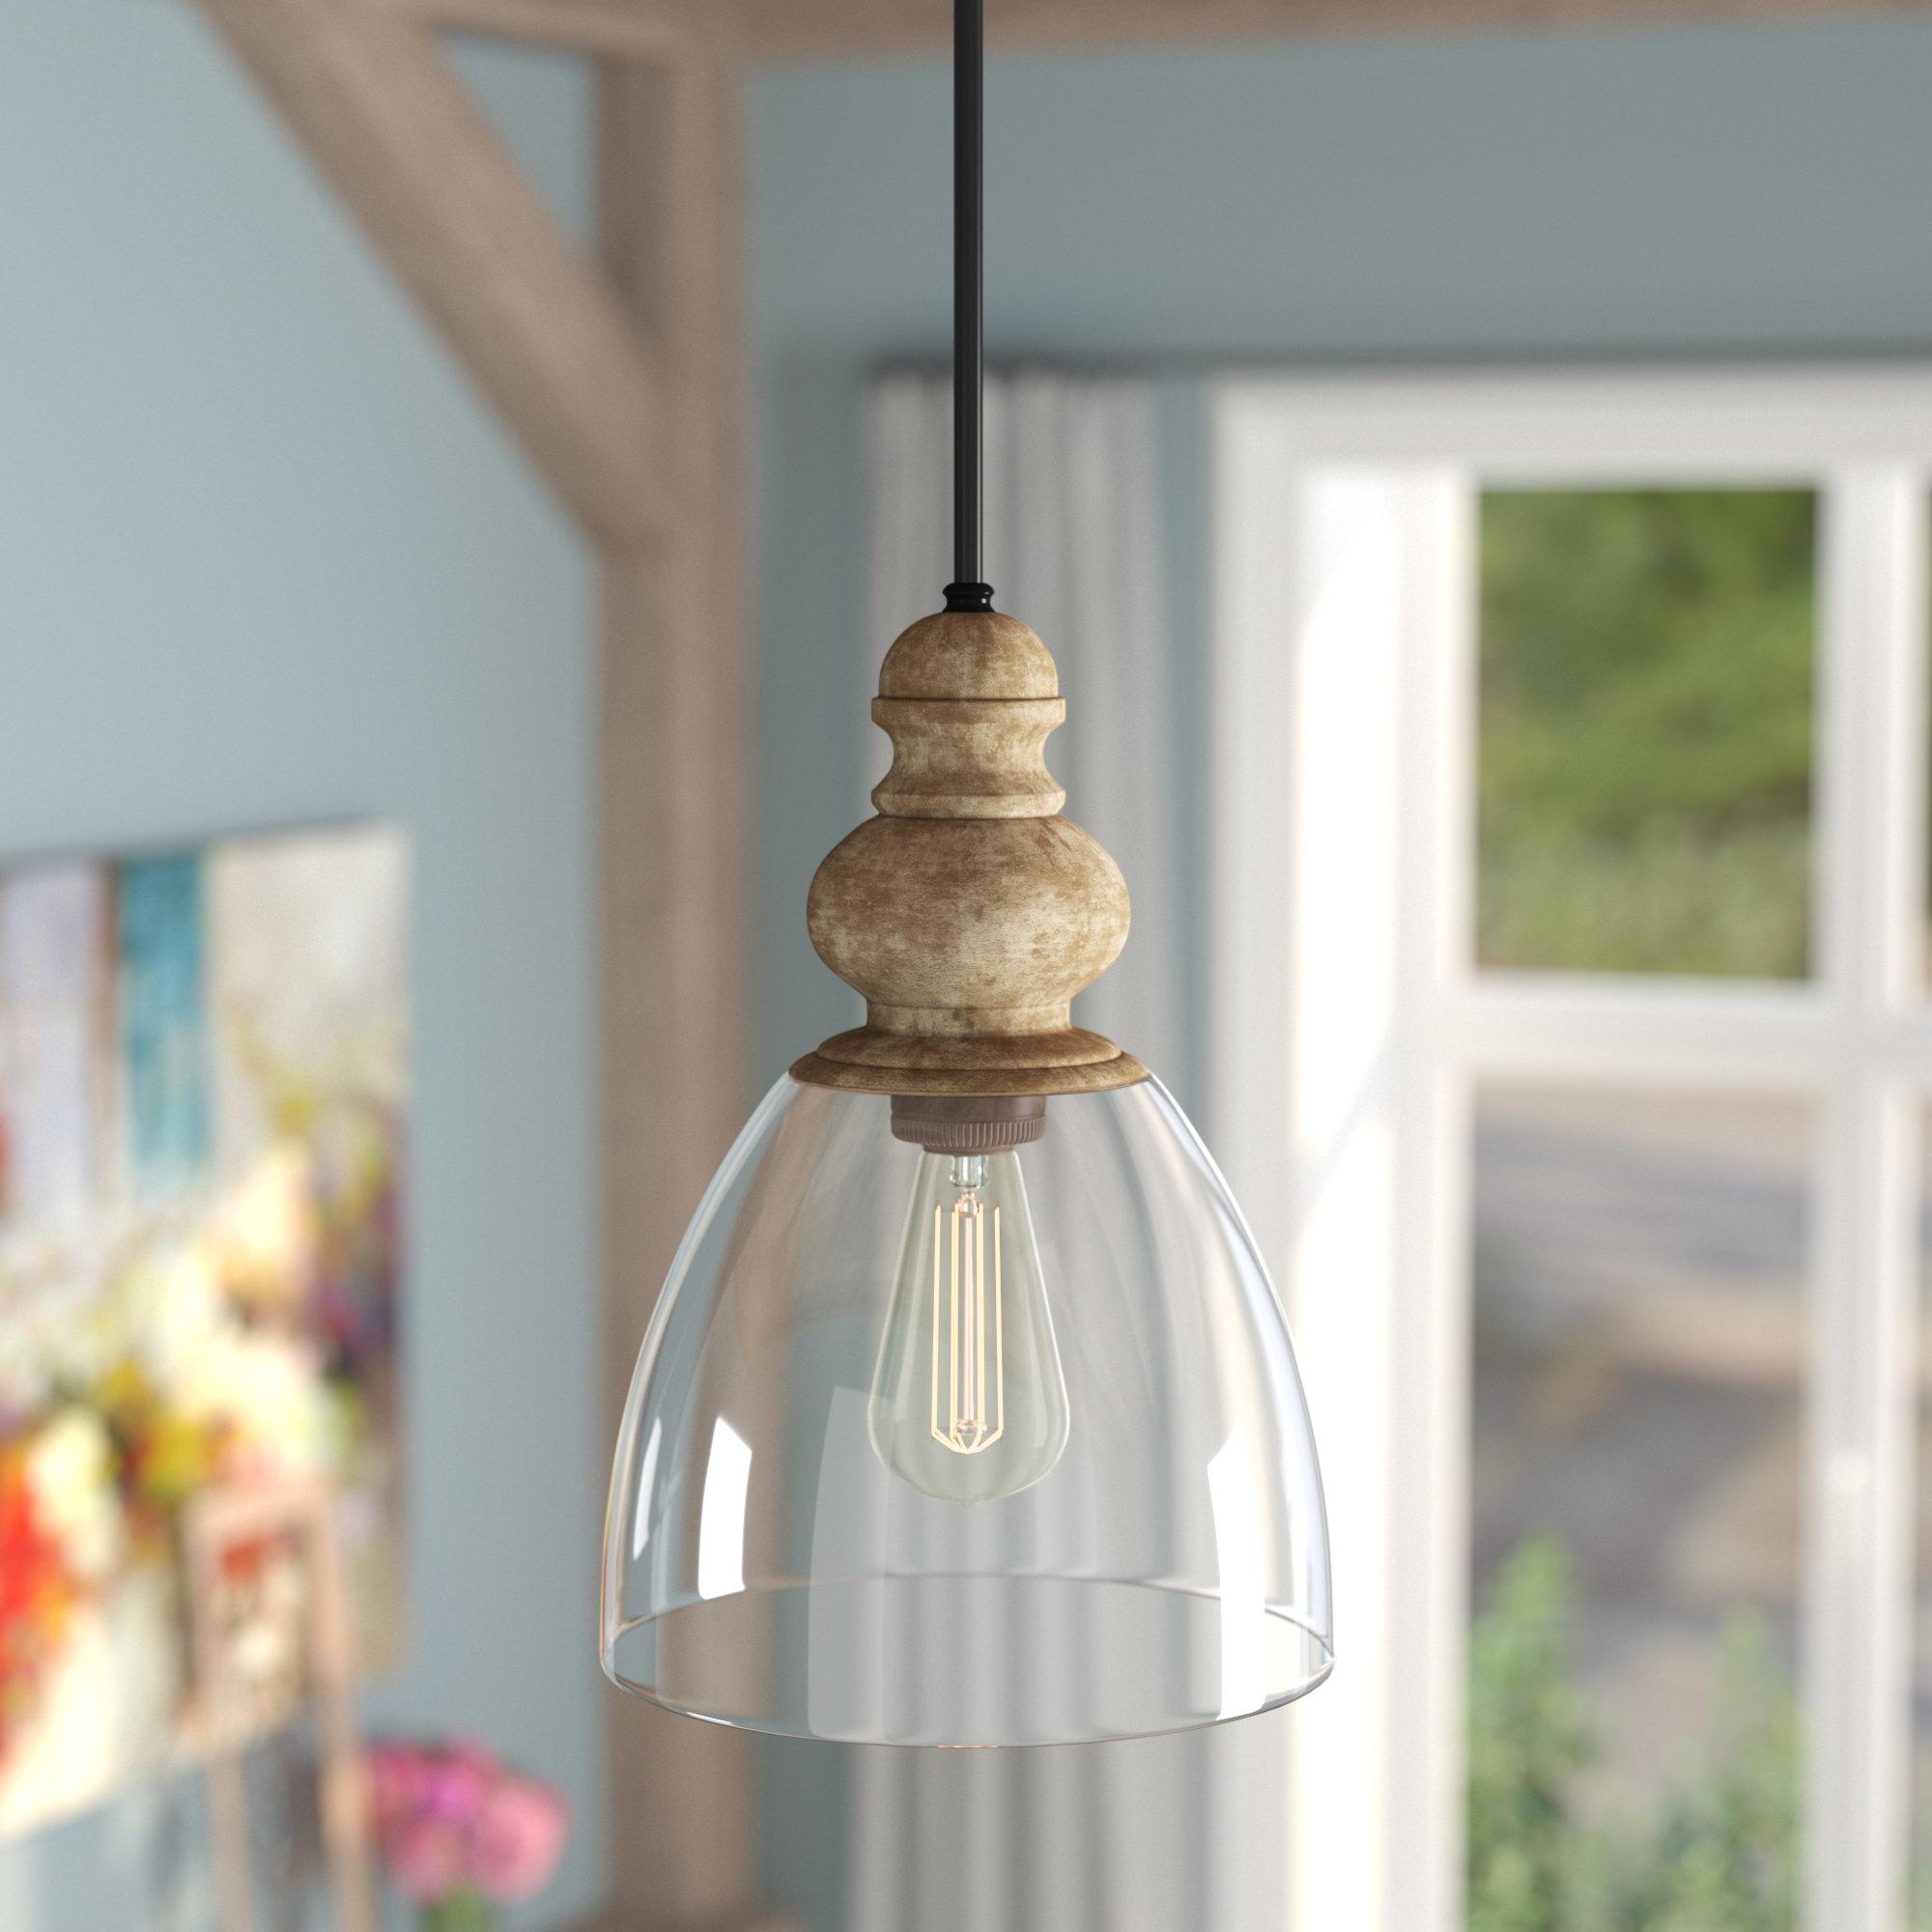 Most Current Carey 1 Light Single Bell Pendants Regarding Laurel Foundry Modern Farmhouse Lemelle 1 Light Single Bell (View 10 of 25)